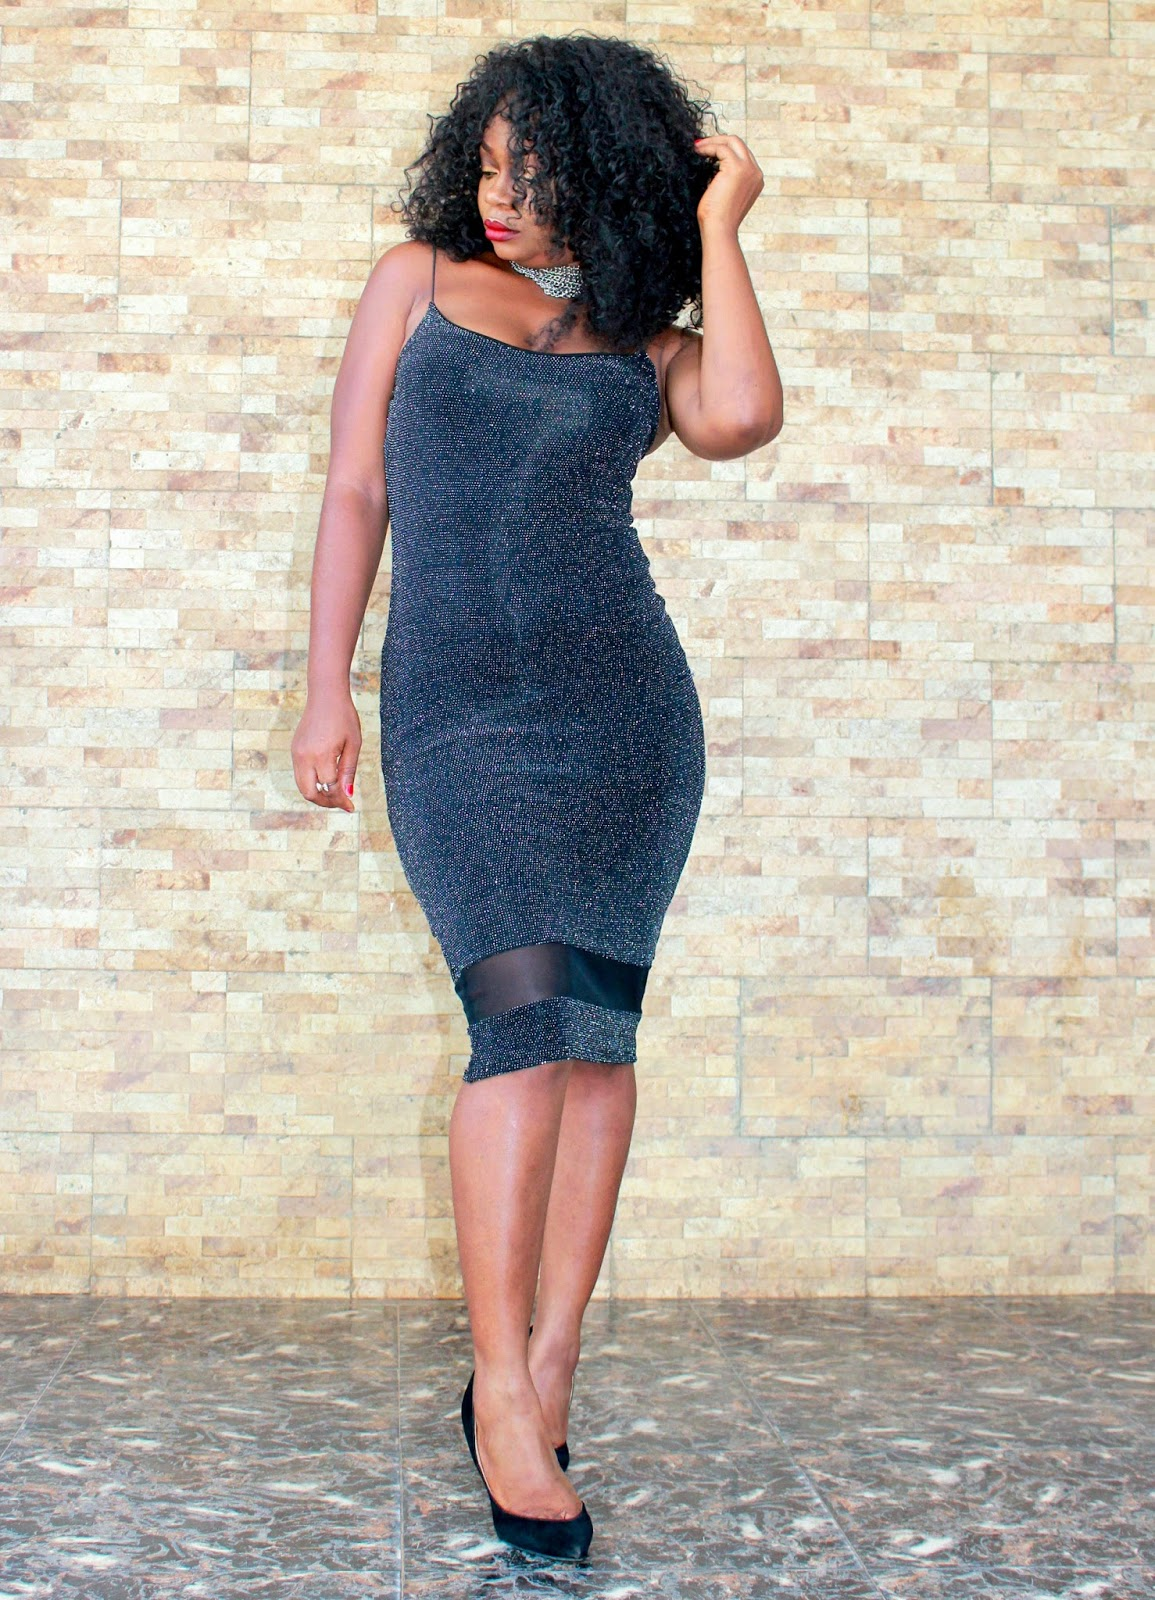 Black shimmery midi dress with mesh detail